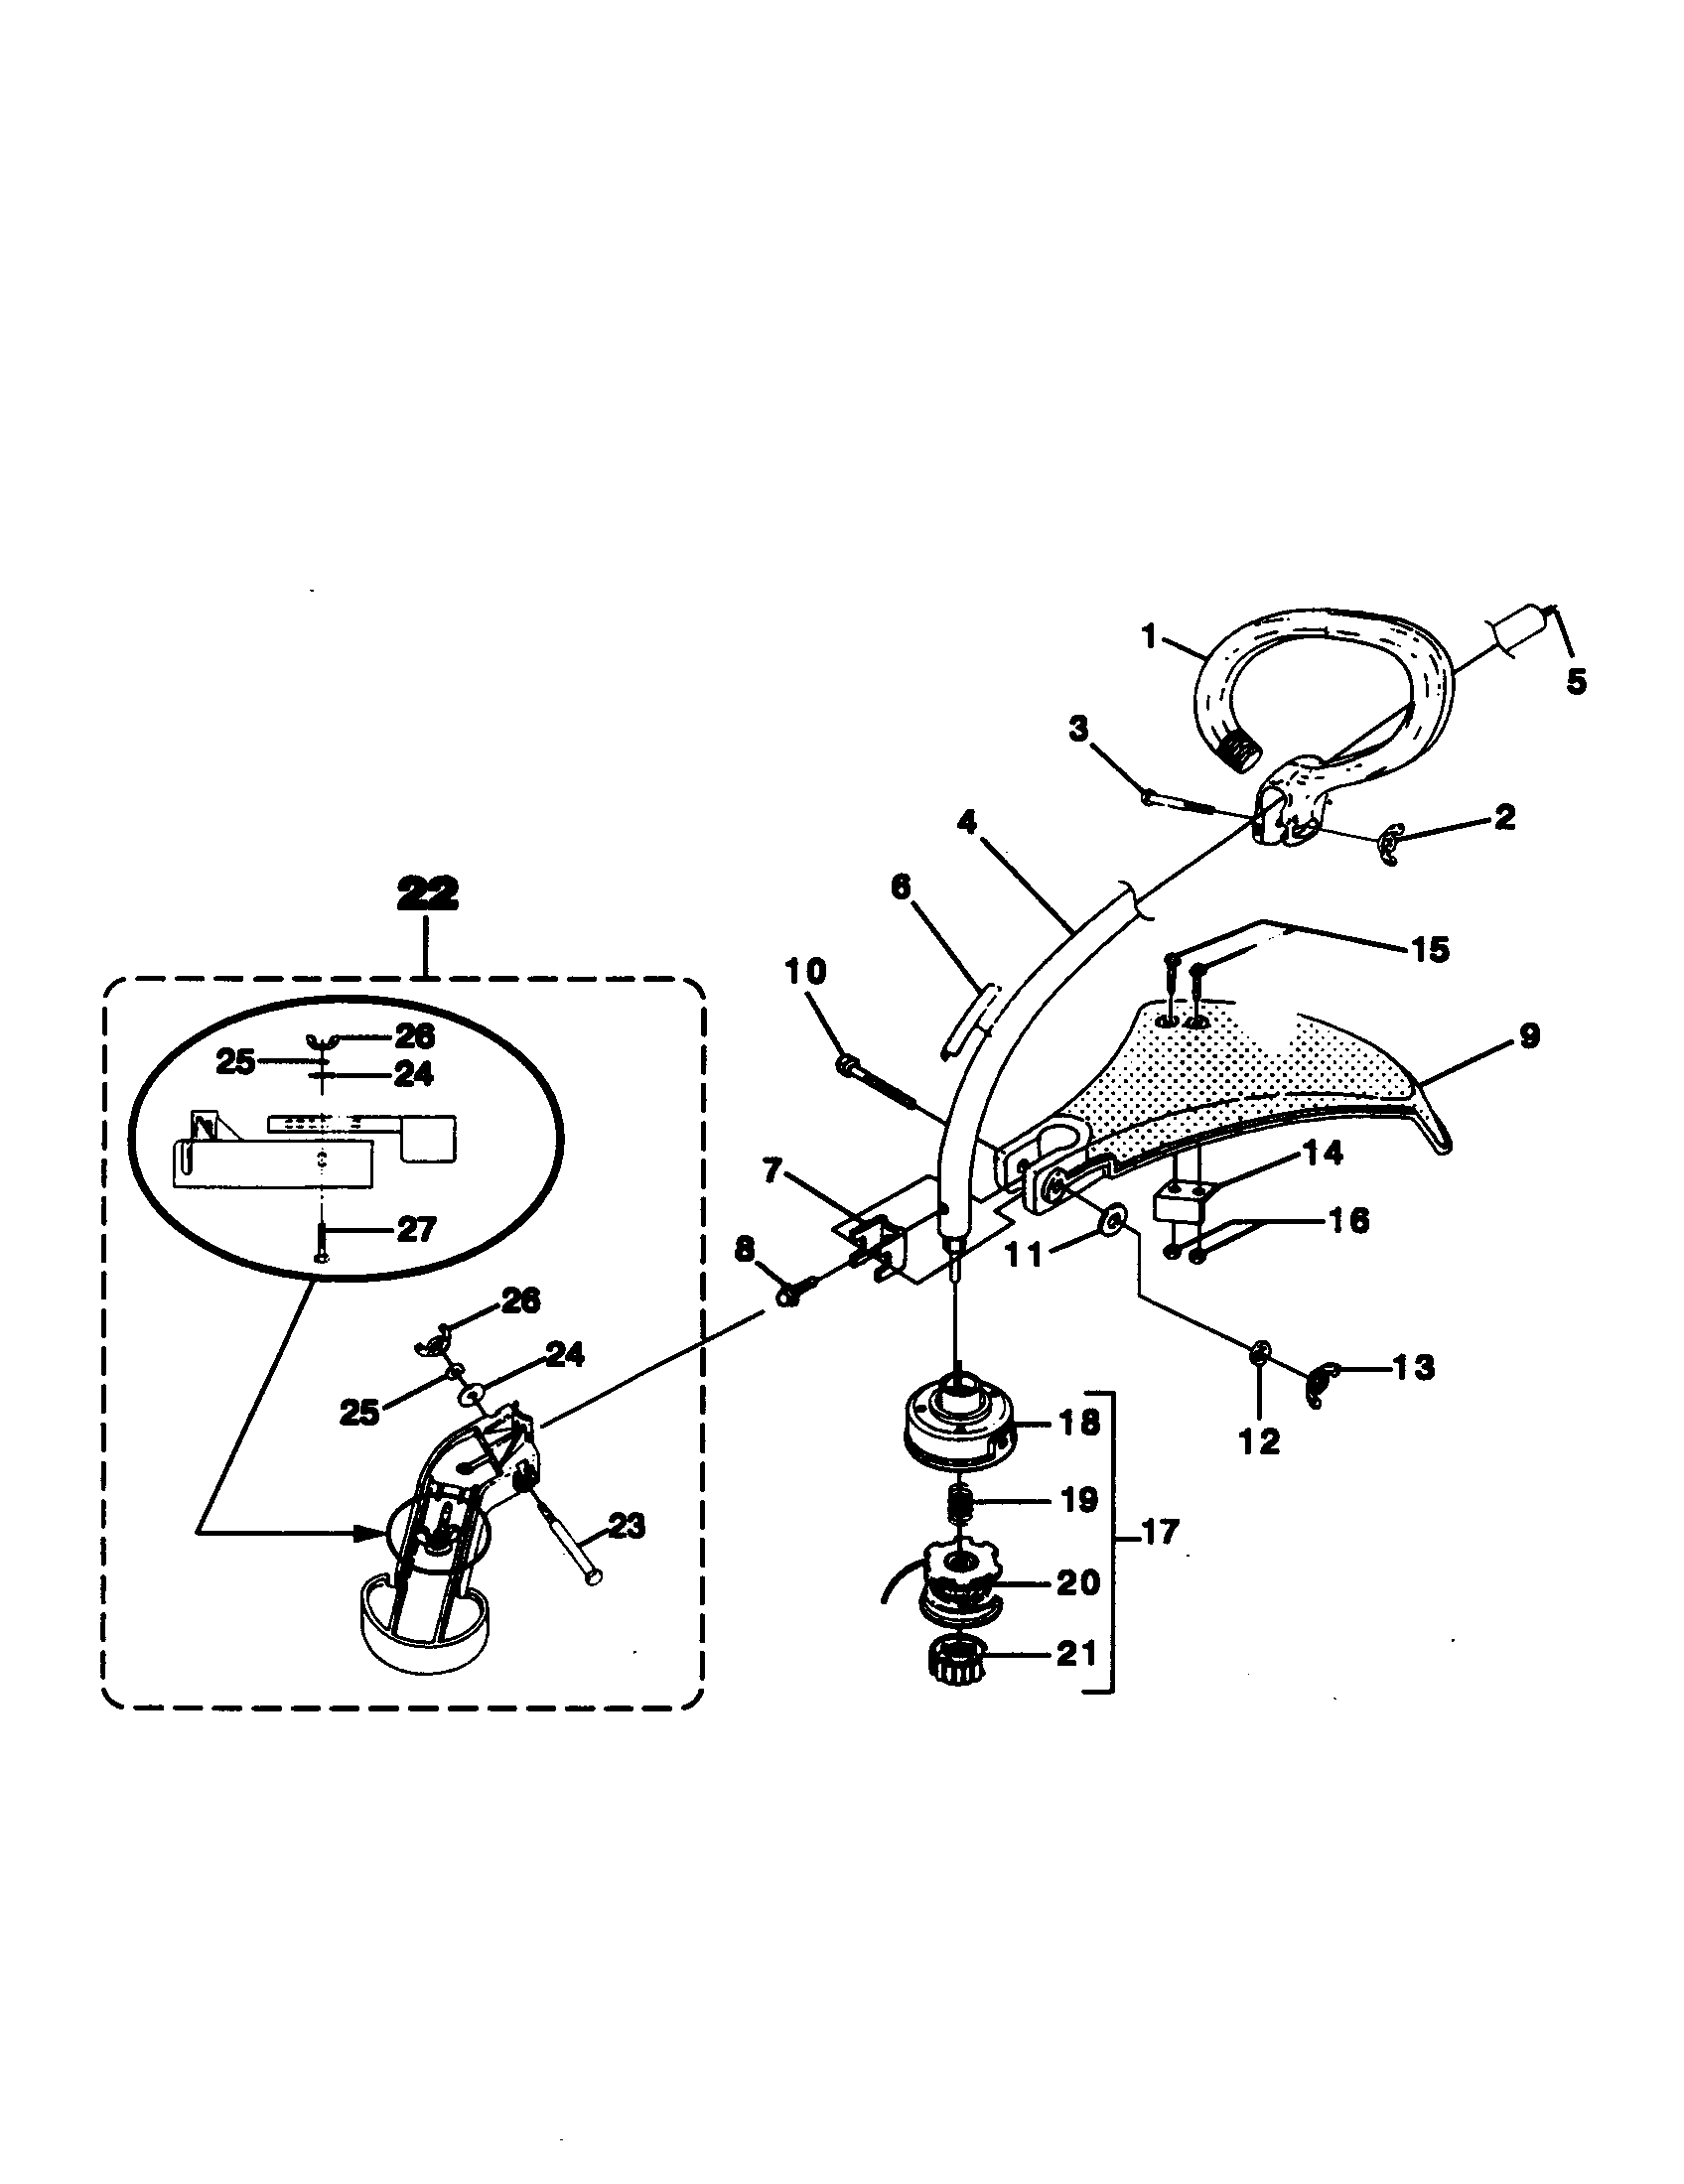 Homelite model UT20728 line trimmers/weedwackers, gas